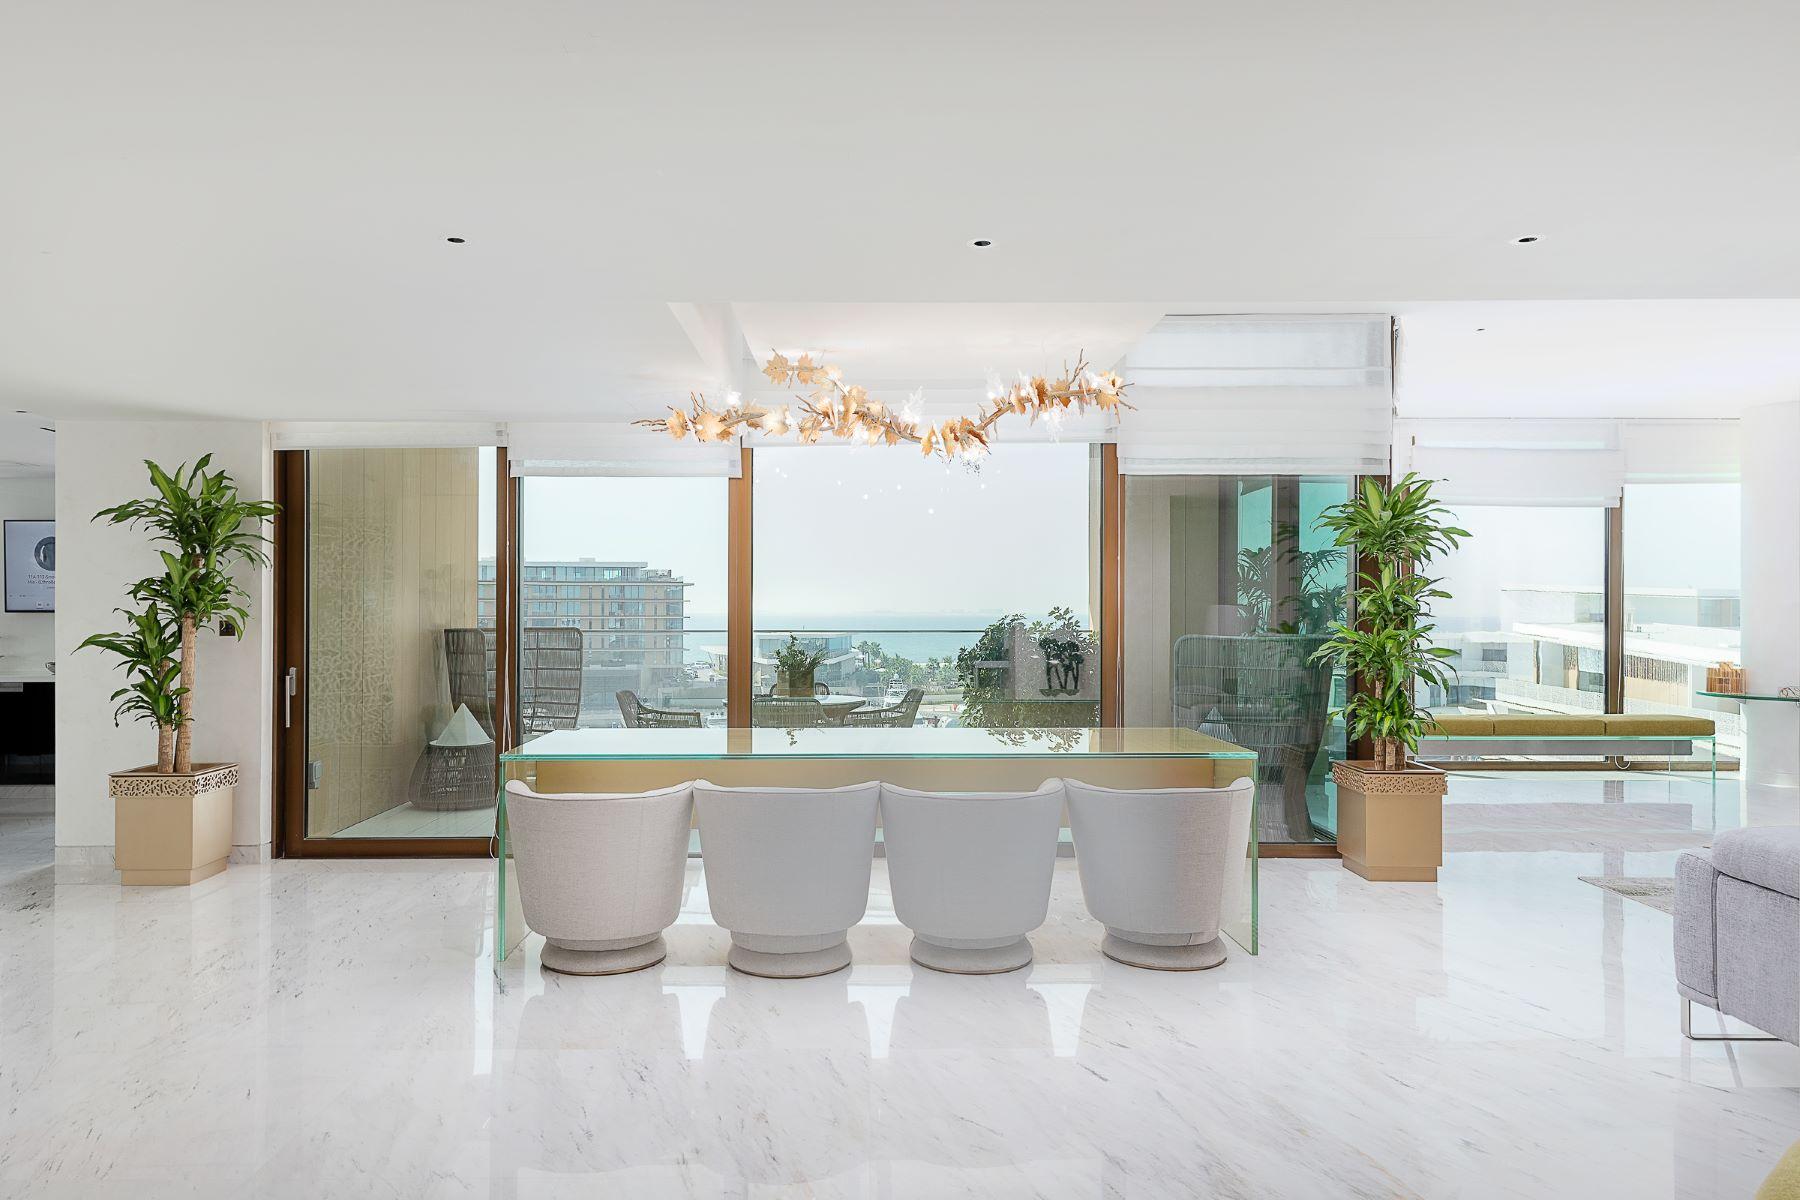 Apartments por un Venta en Unique Five Bedrooms Bulgari Penthouse Dubai, Dubai Emiratos Arabes Unidos